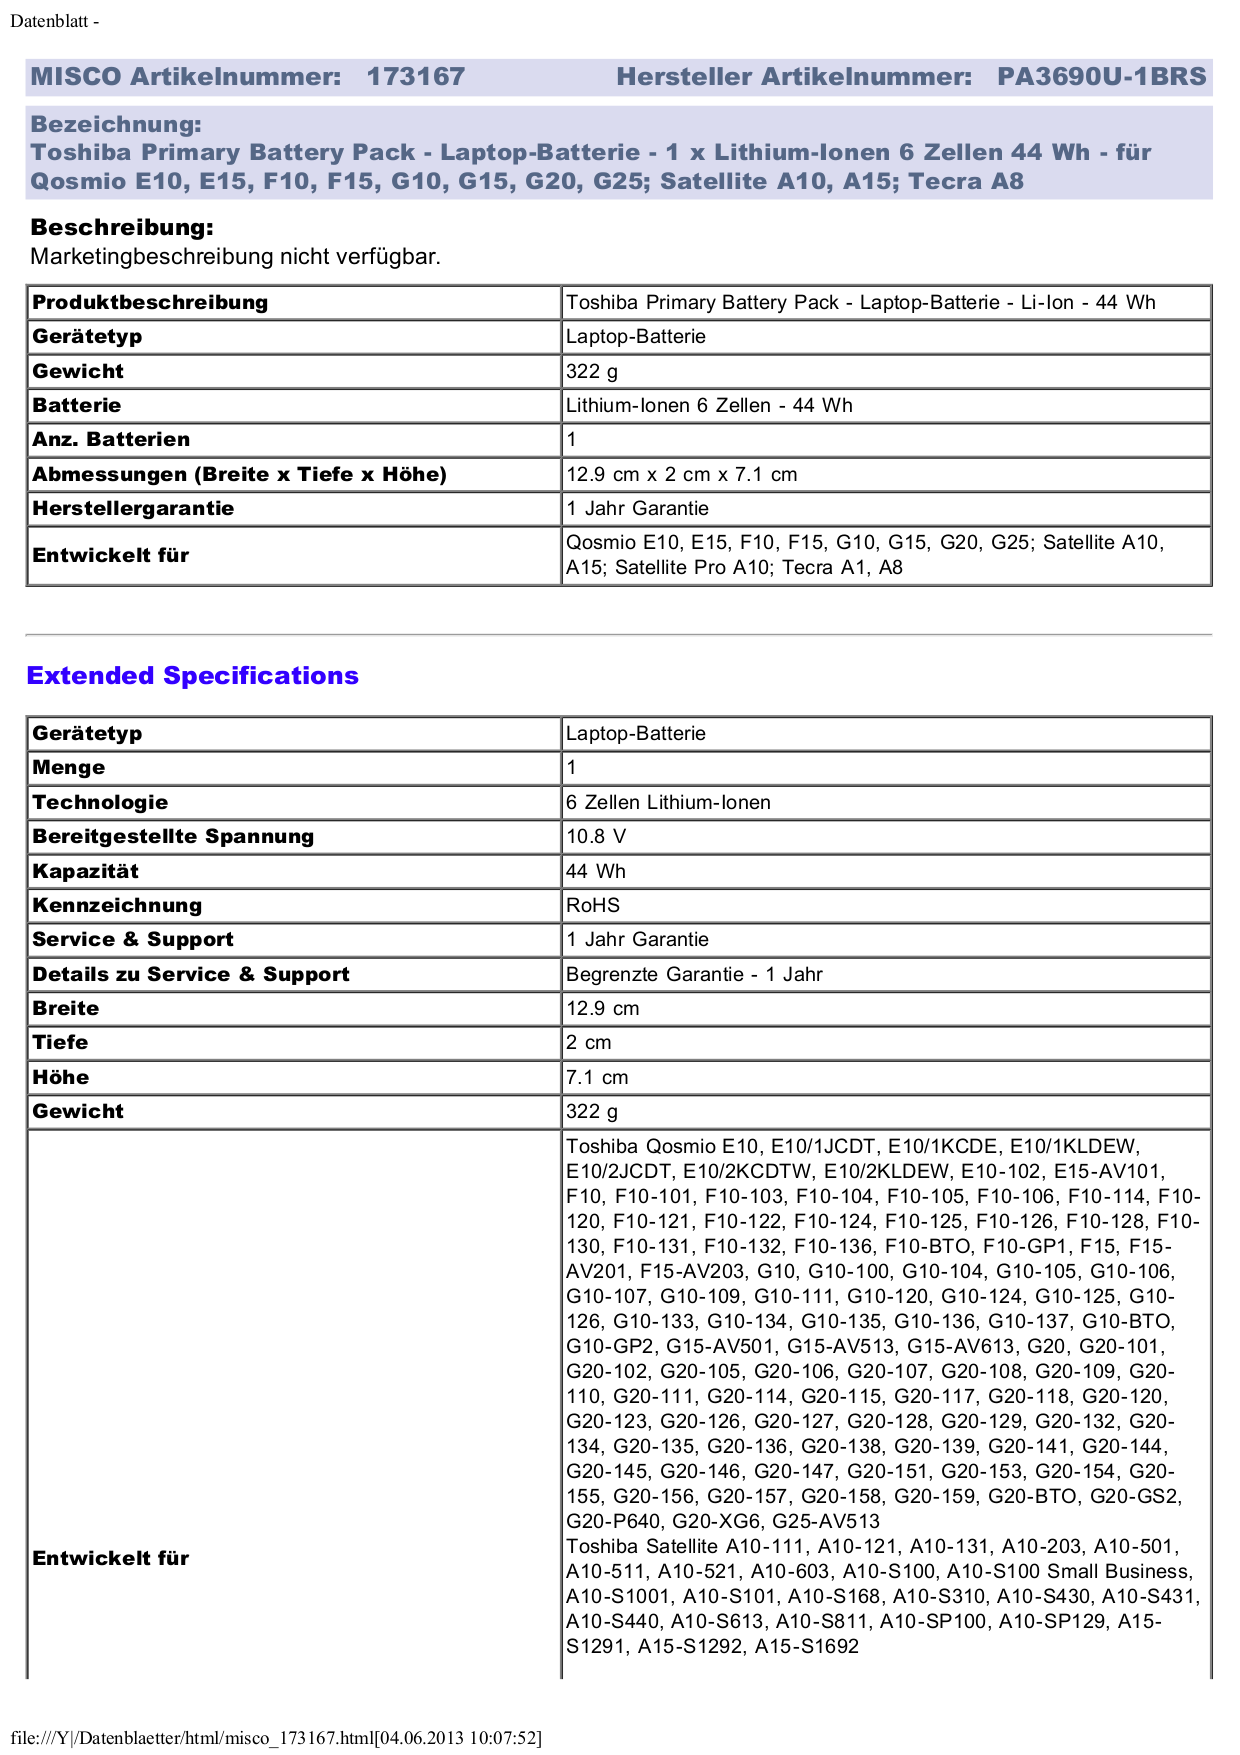 Toshiba G20 Manual Olympus 85mm F20 Lens Exploded Parts Diagram Pdf Array Download Free For Satellite A10 Sp129 Laptop Rh Umlib Com